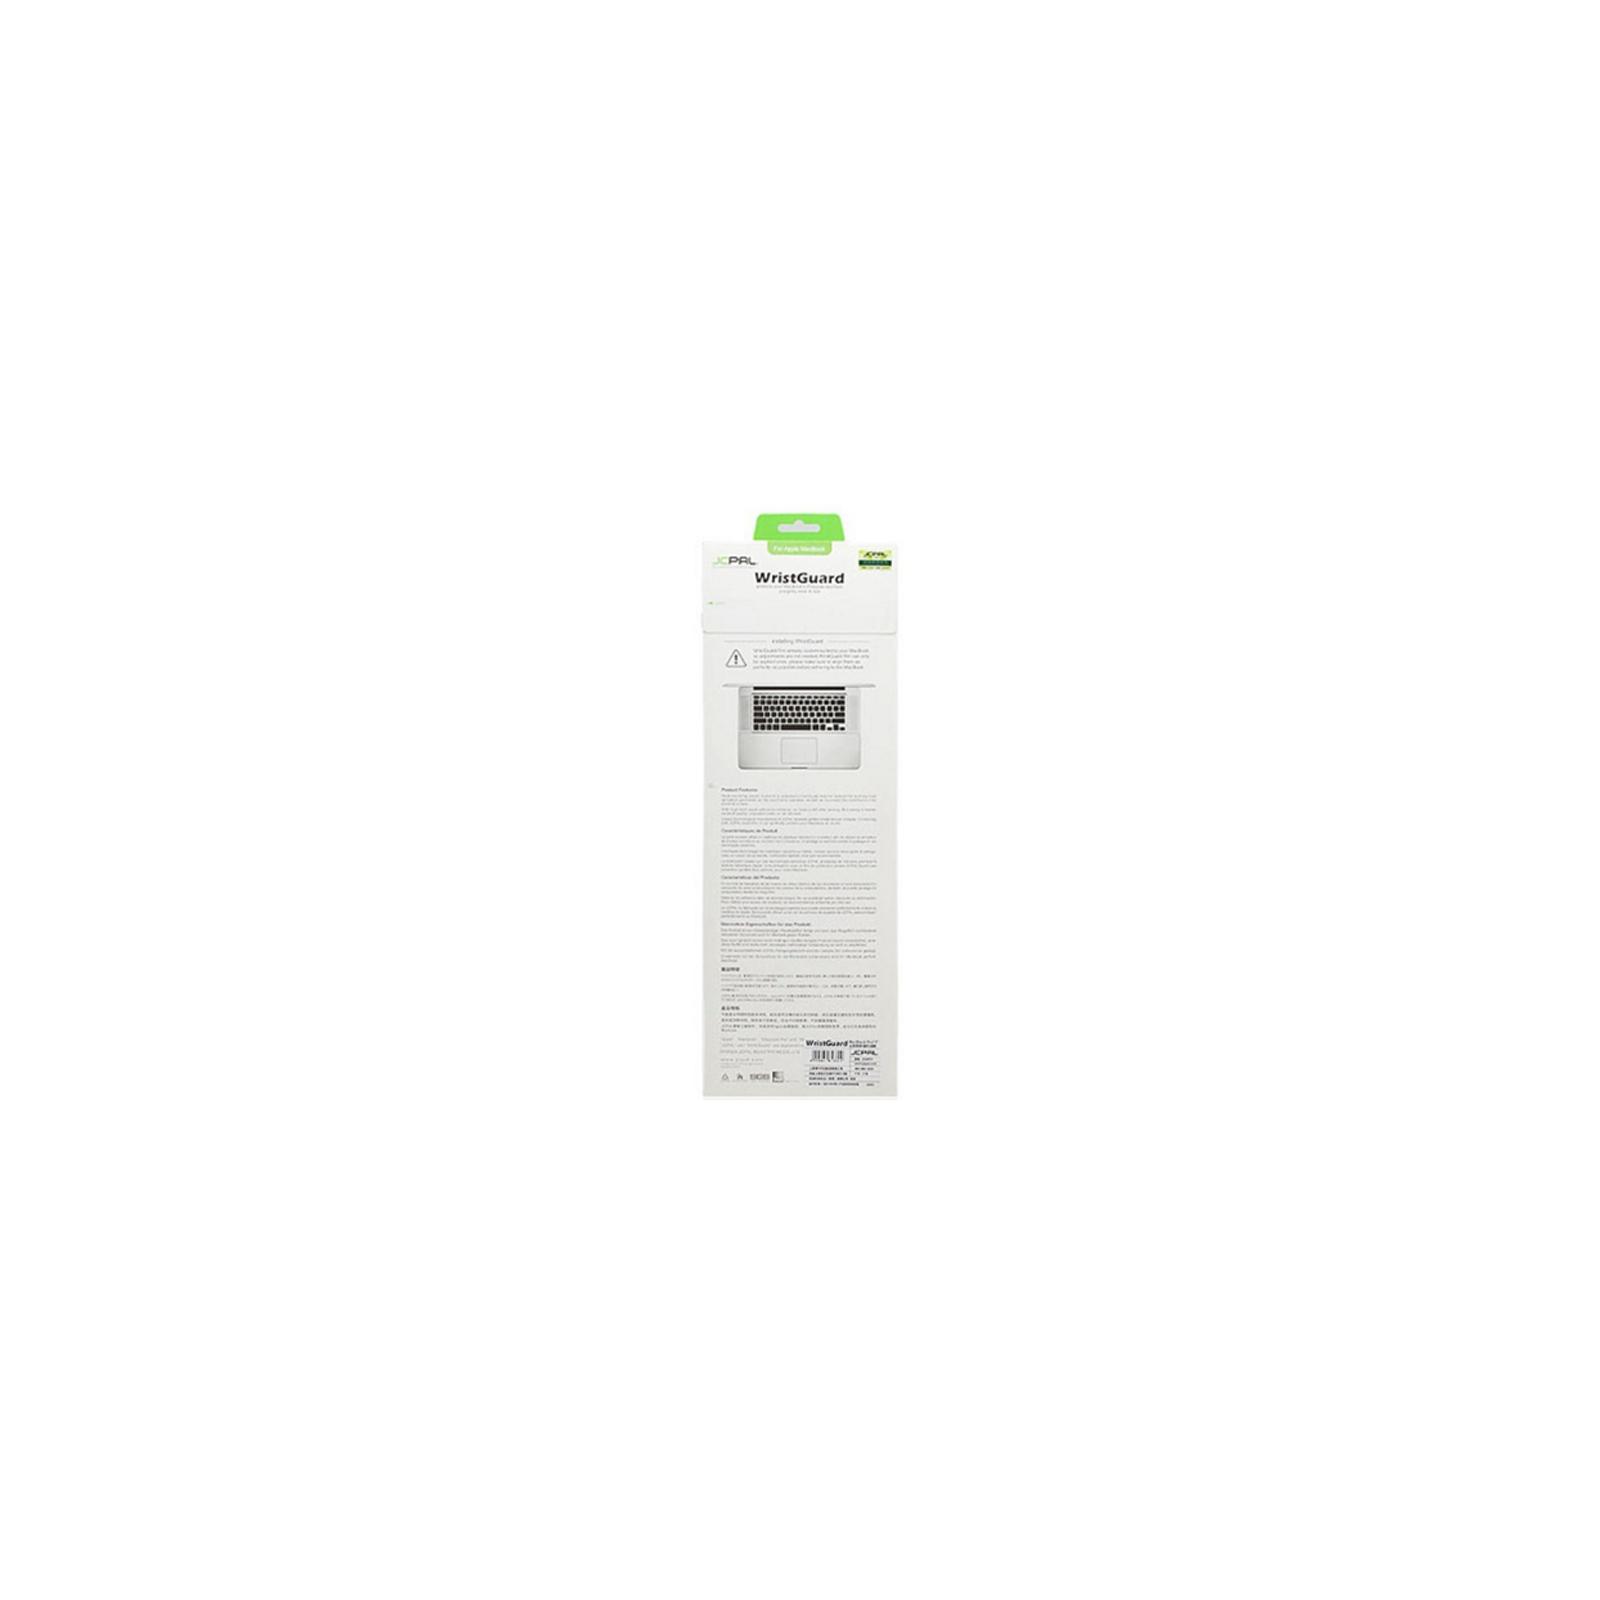 Пленка защитная JCPAL WristGuard Palm Guard для MacBook Pro 13 (JCP2014) изображение 2